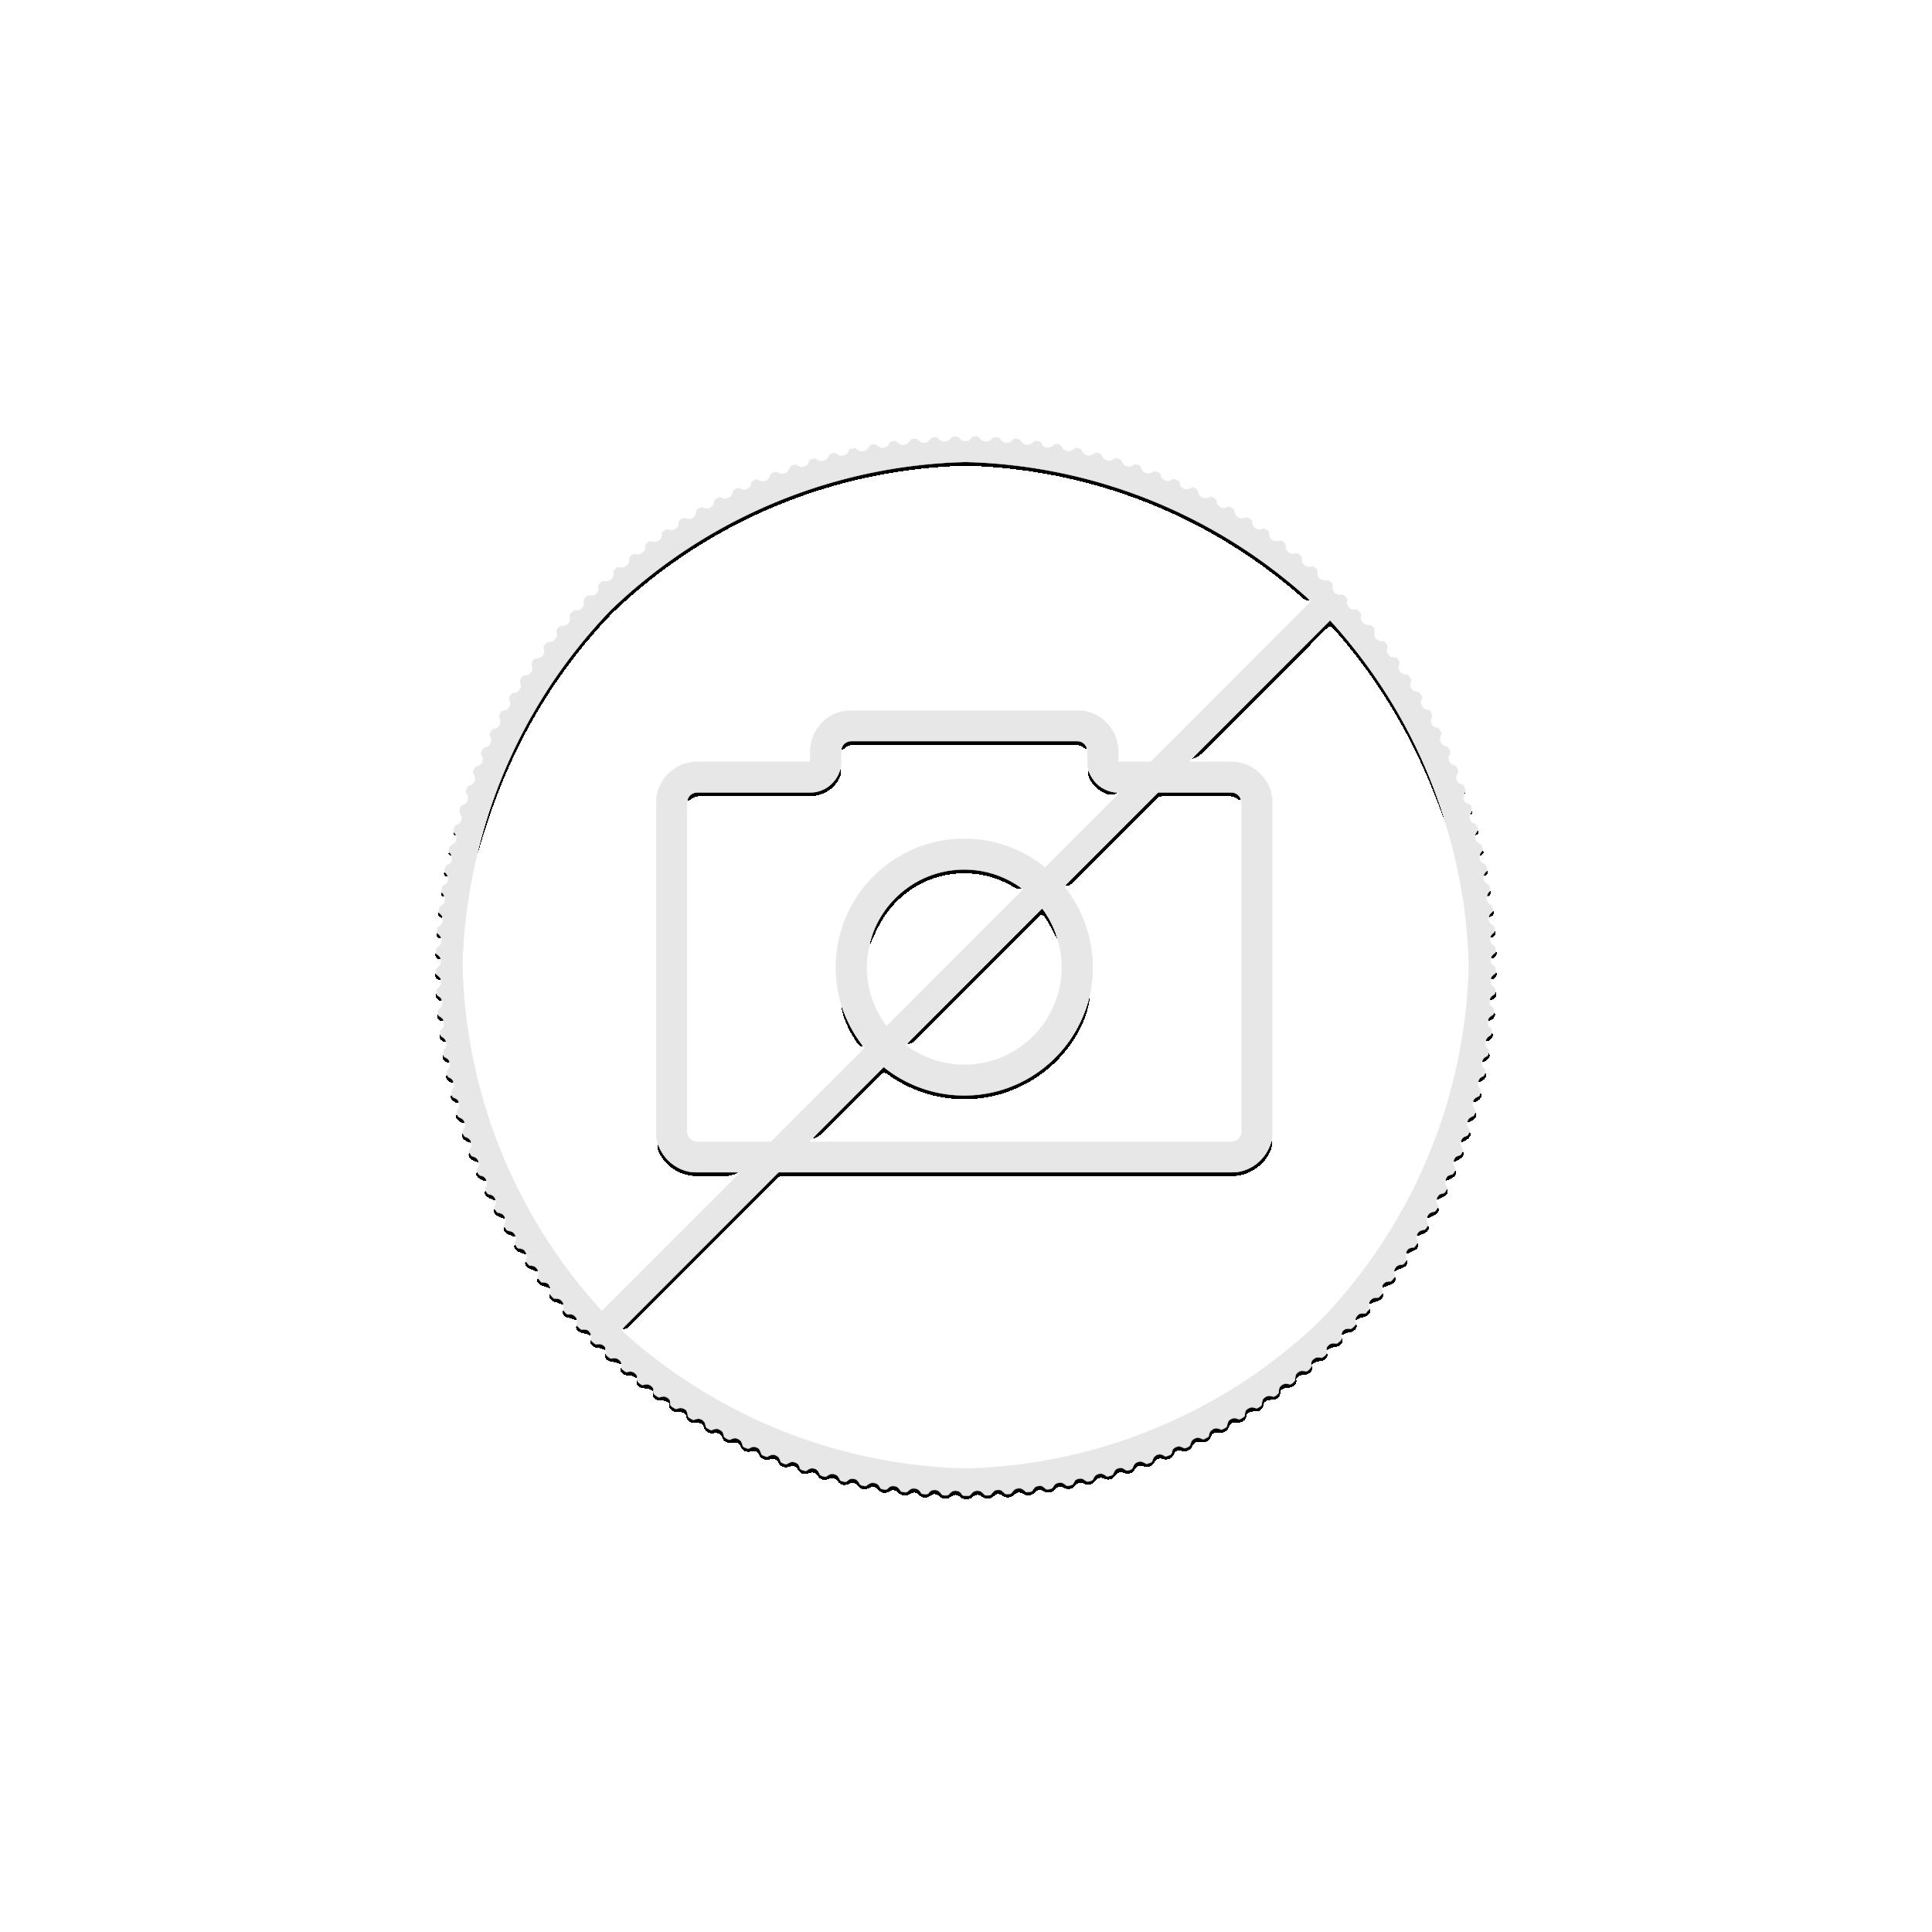 Gold coin Cien pesos Chili